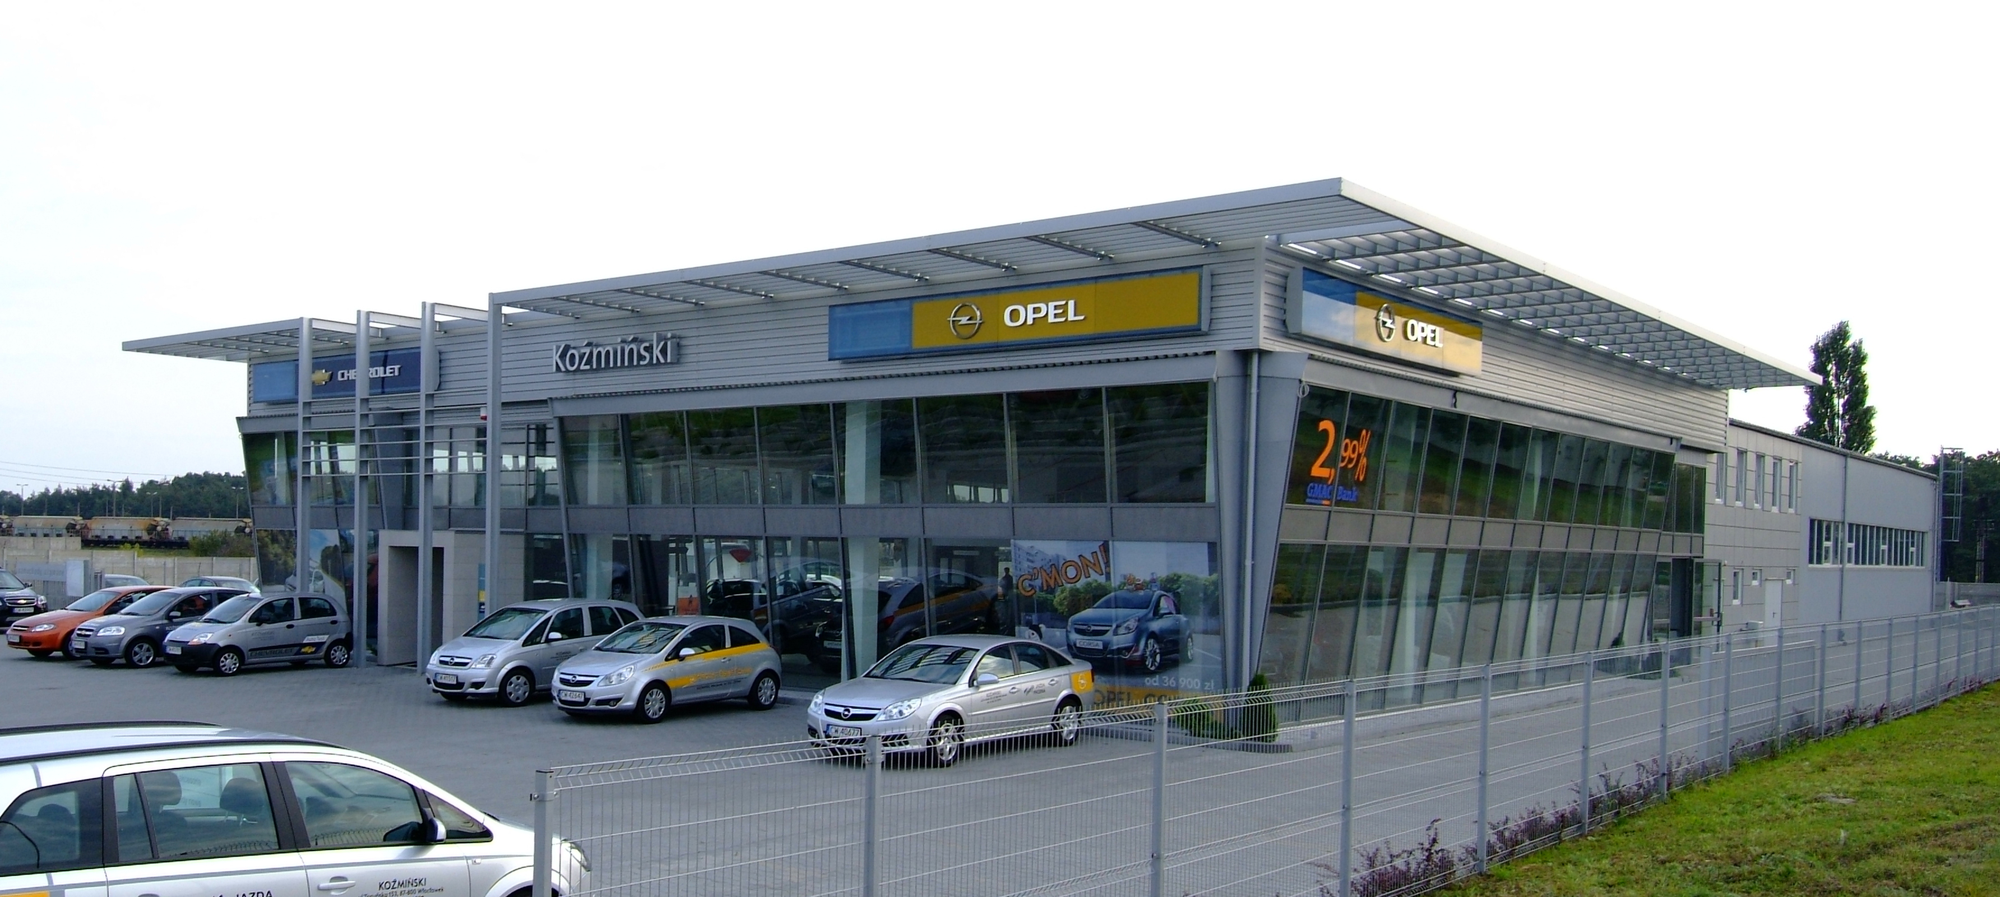 Hala handlowa - Opel Koźmiński